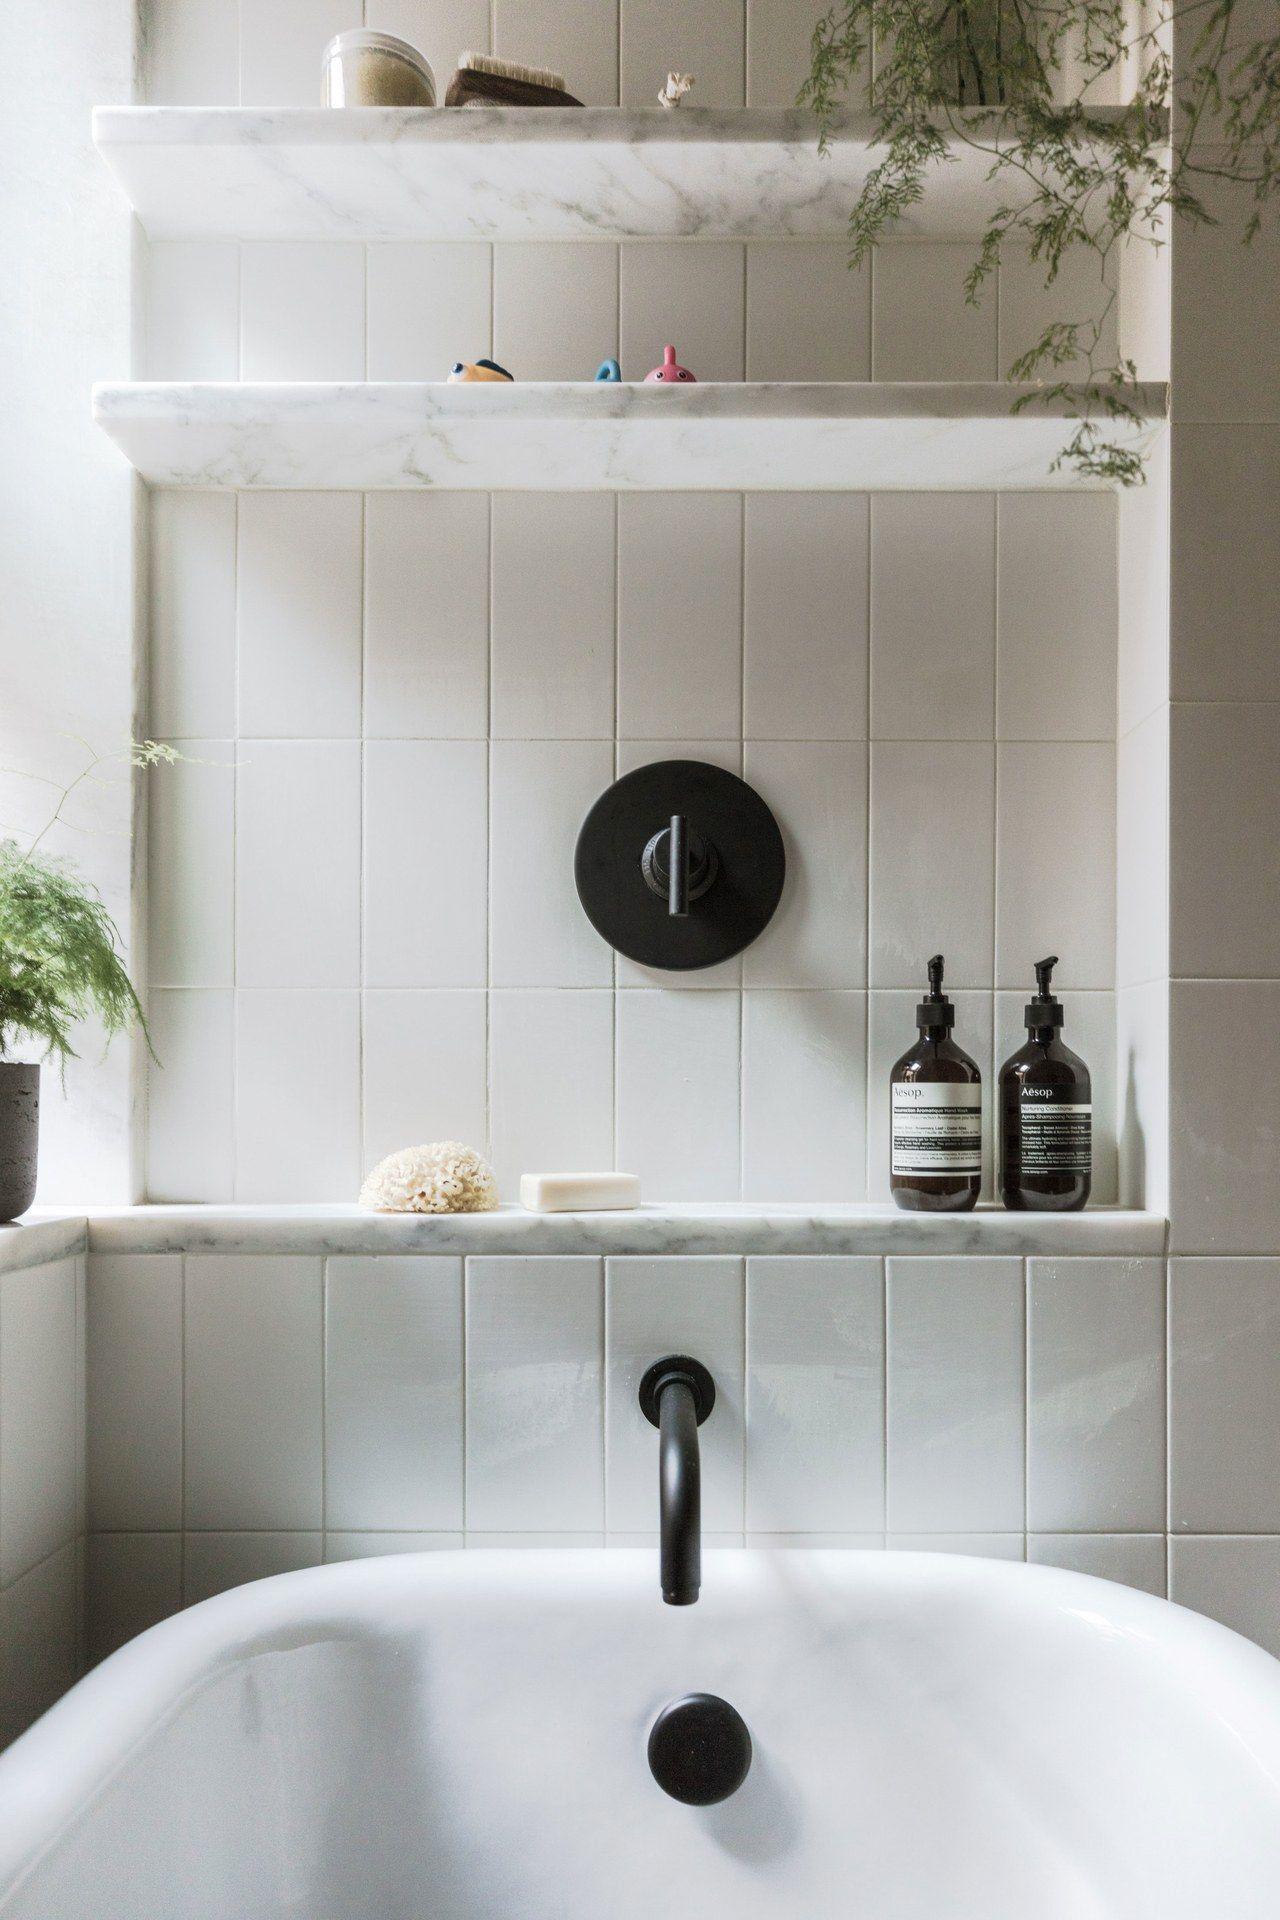 25 Stylish Bathroom Shelf Ideas The Most Clever Bathroom Storage Solutions